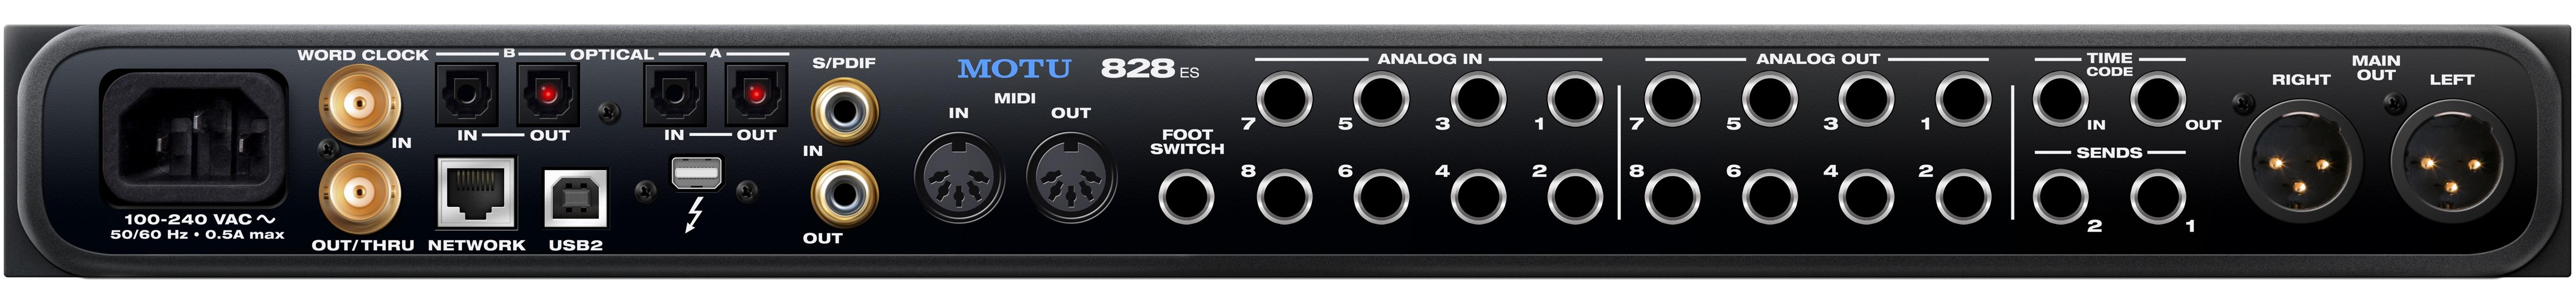 motu 828es audio interface - back